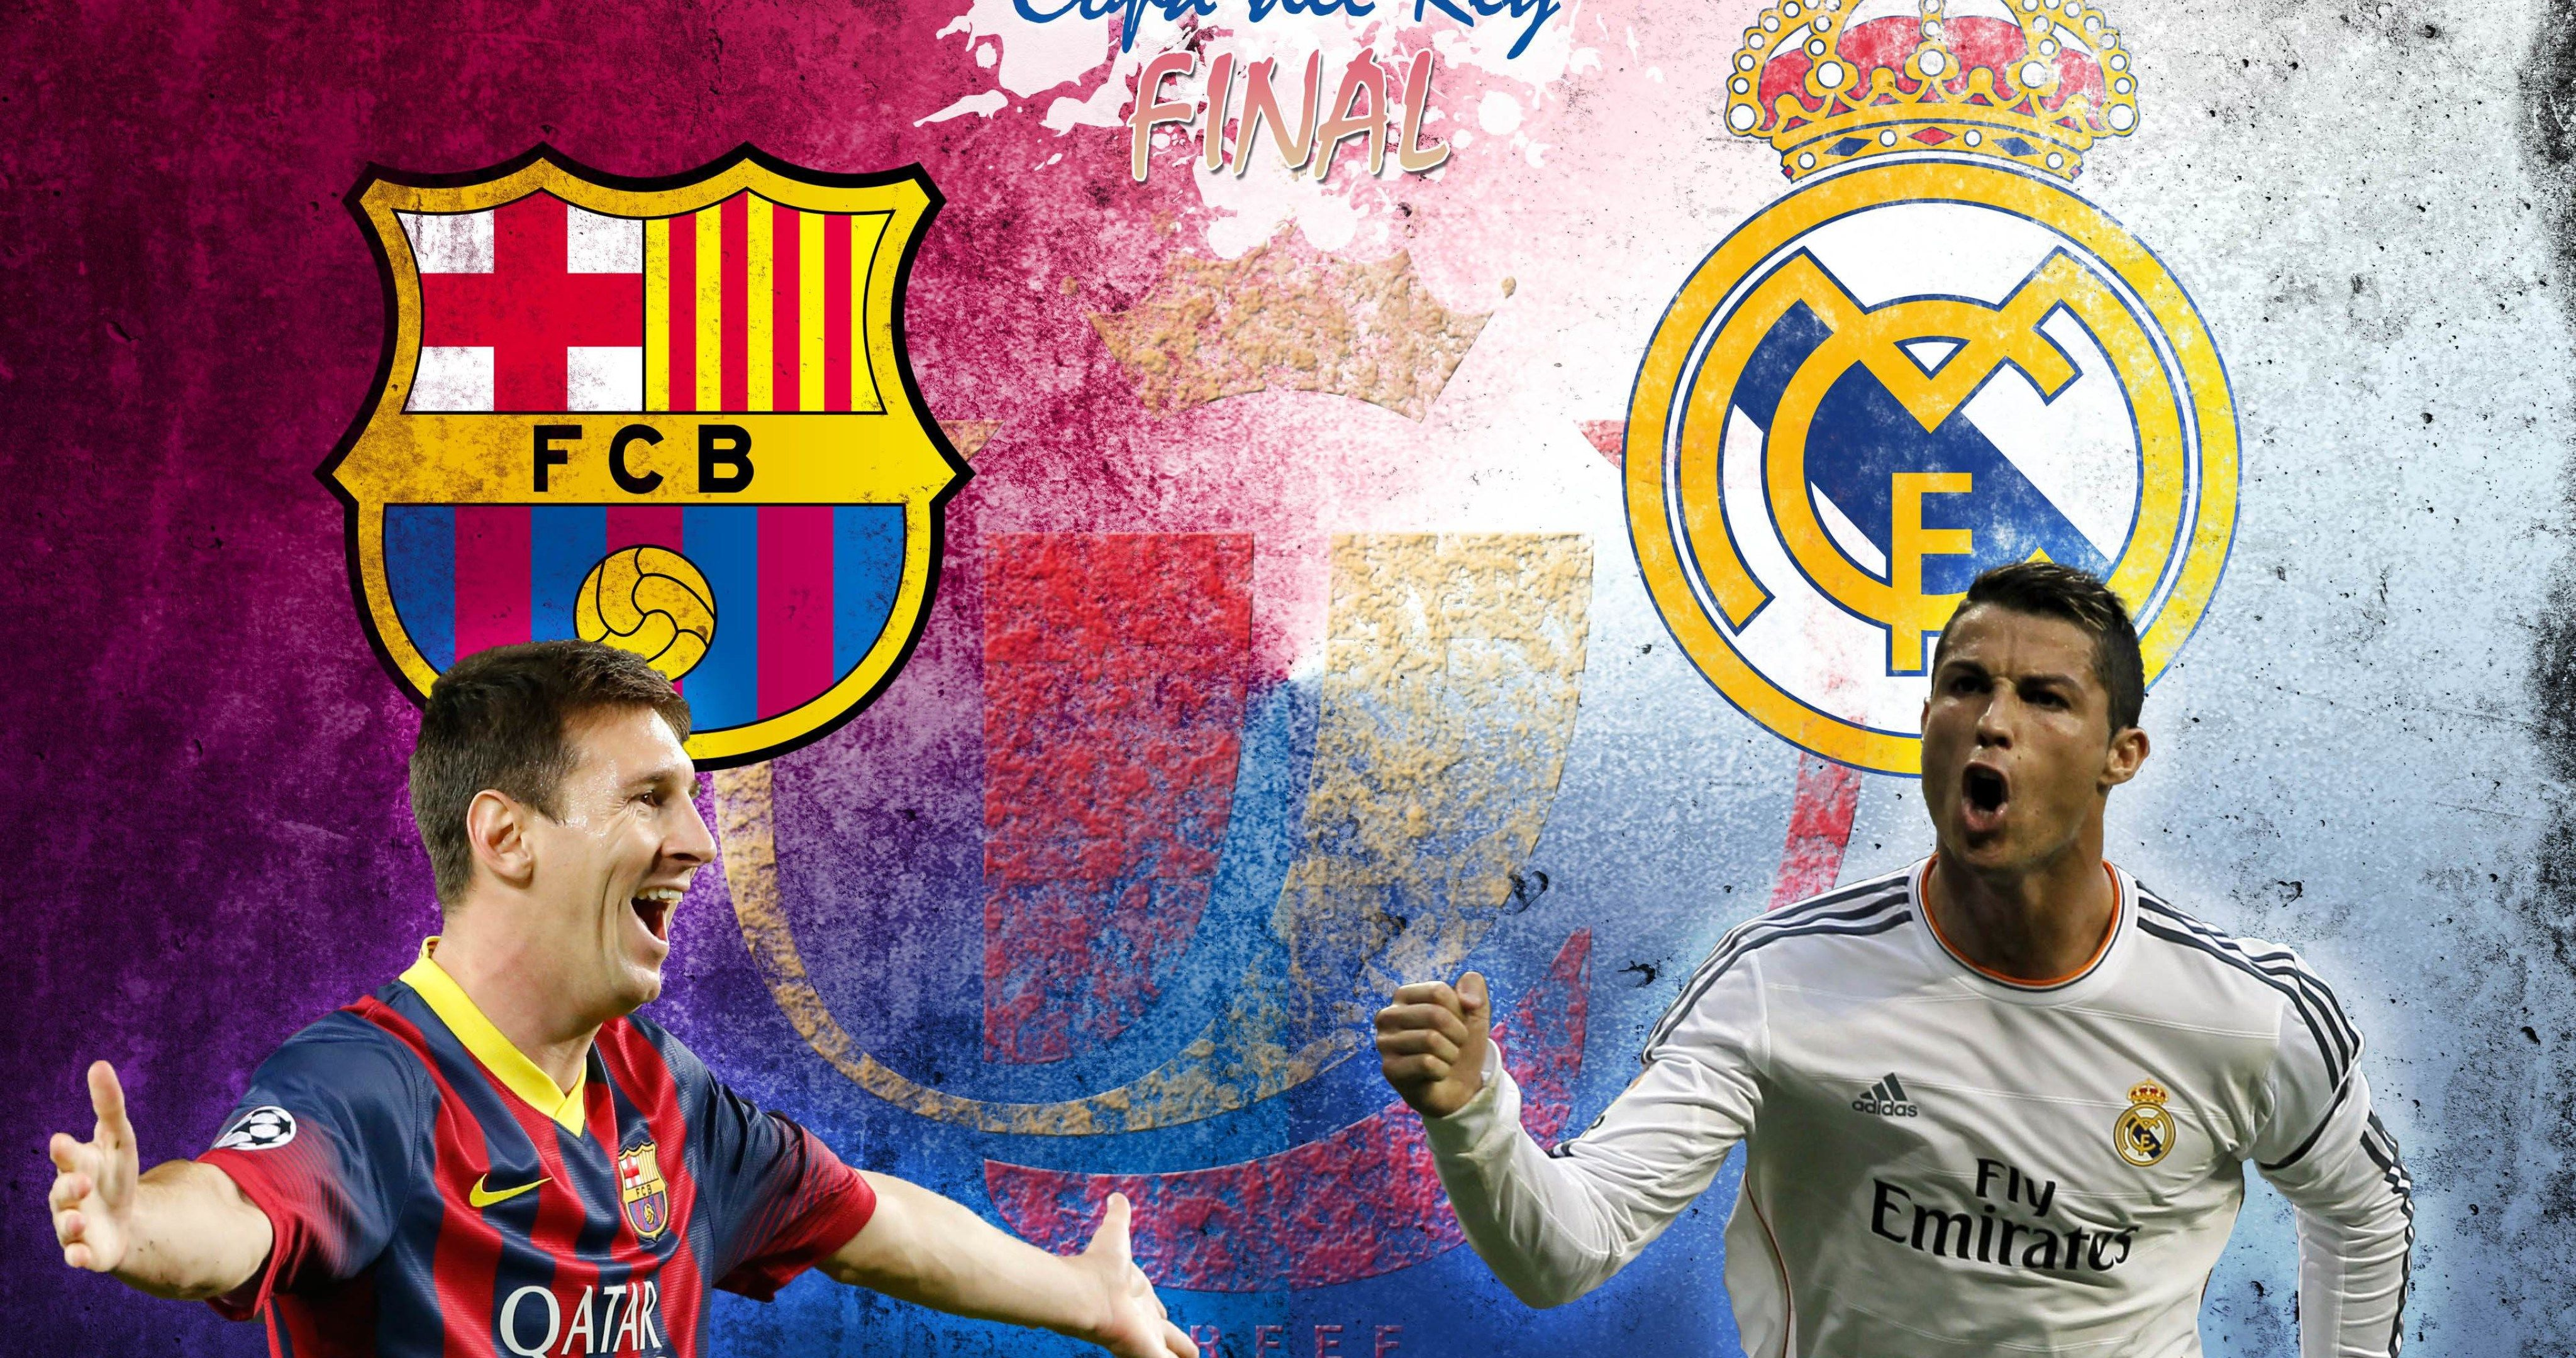 Leo Messi And Christiano Ronaldo Wallpaper 4k Ultra Hd Wallpaper Ronaldo Wallpaper Christiano Ronaldo Christiano Ronaldo Wallpaper